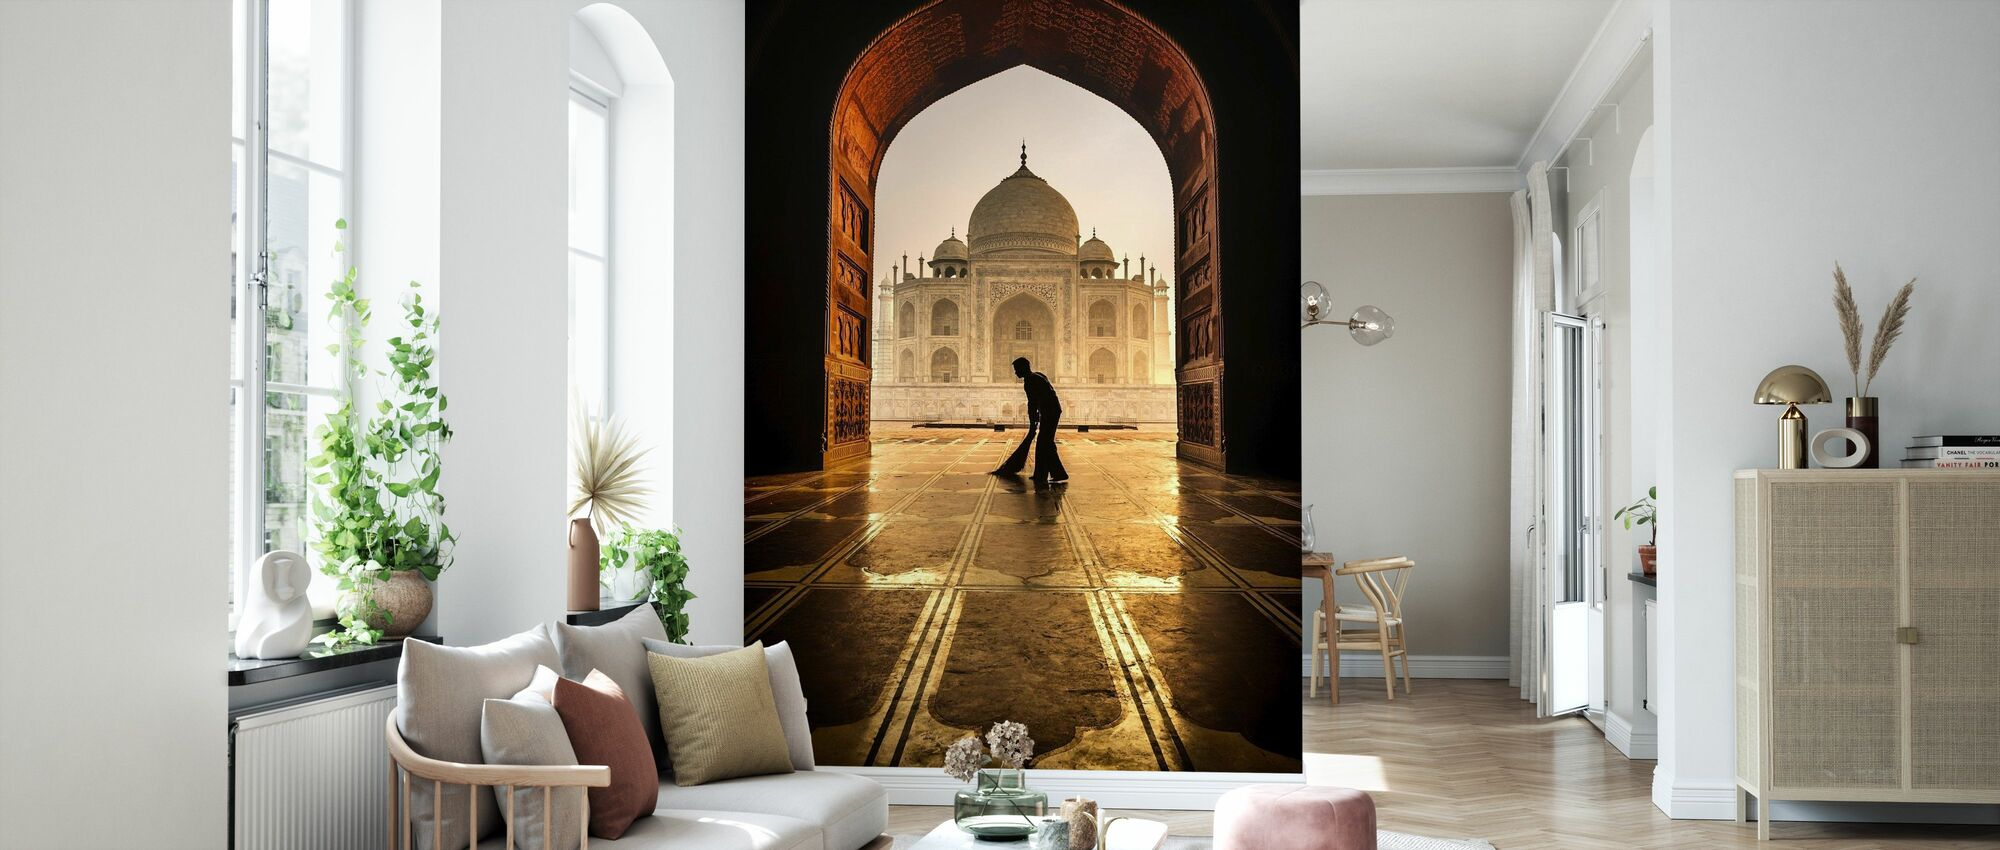 Taj Mahal Reiniger - Tapete - Wohnzimmer